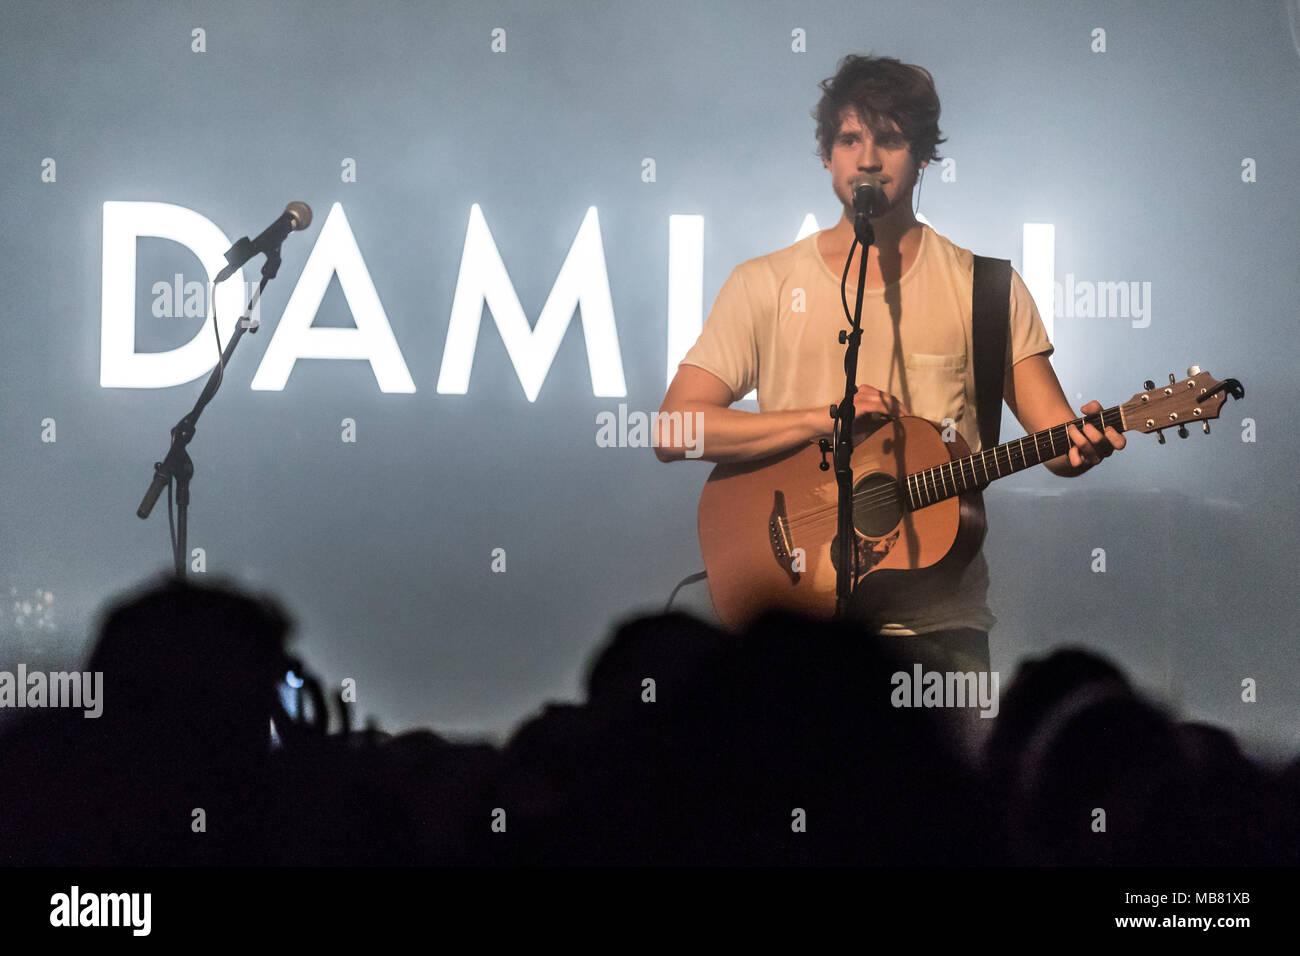 The Swiss musician Damian Lynn live at the Schüür Lucerne, Switzerland - Stock Image